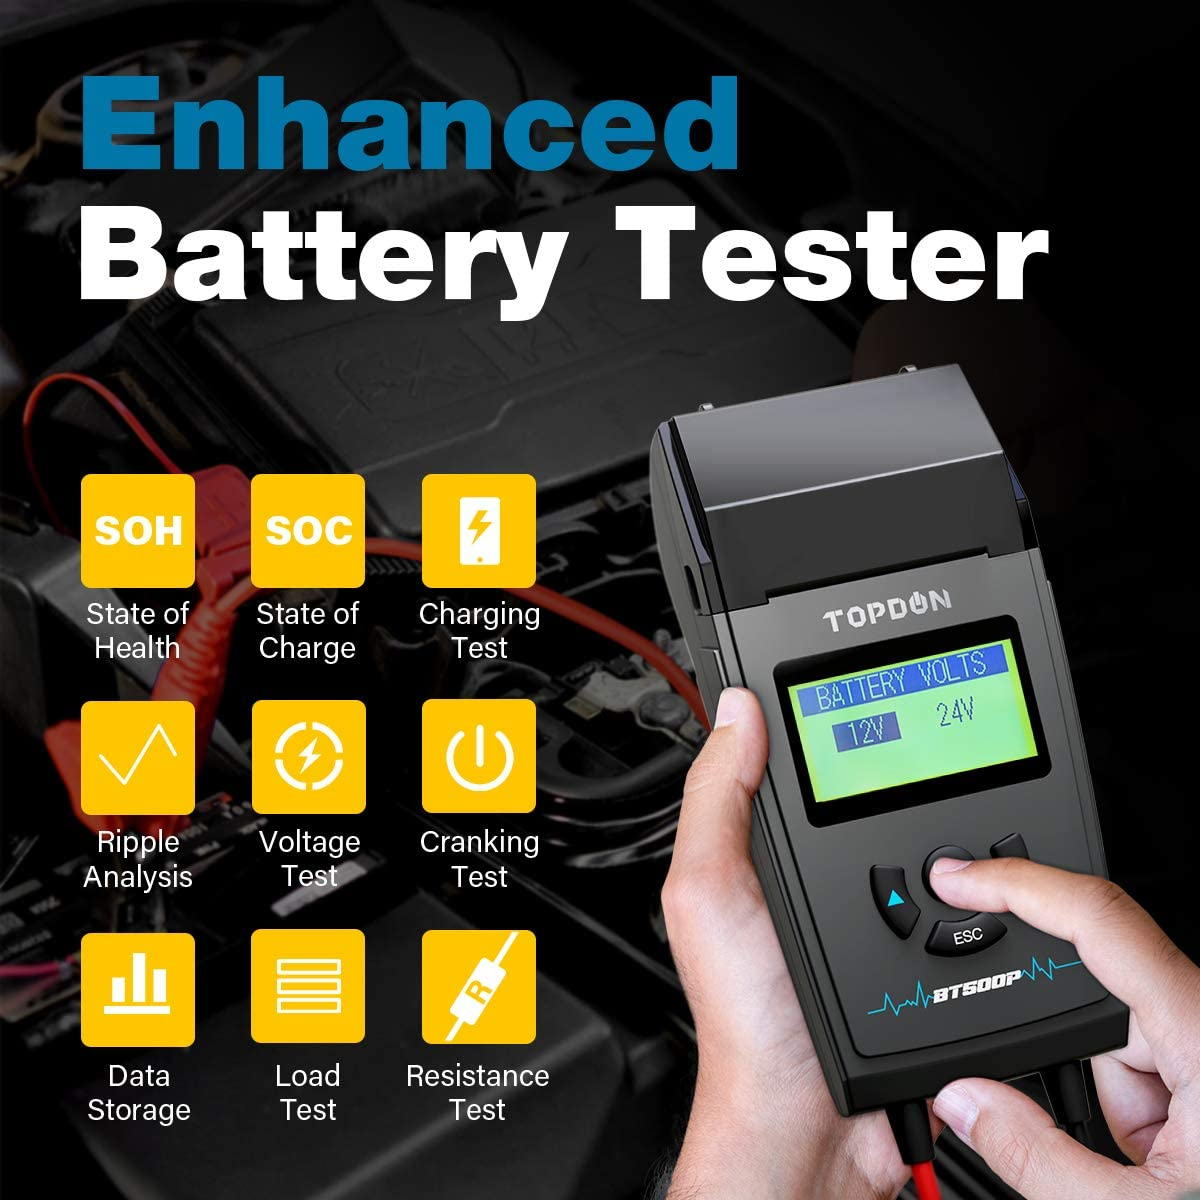 Automotive Alternator Tester for Car Motorcycle Motorboat Truck Car Battery Tester with Printer Cranking and Charging System Battery Analyzer TOPDON BT500P 12V//24V 100-1700 CCA Battery Load Tester